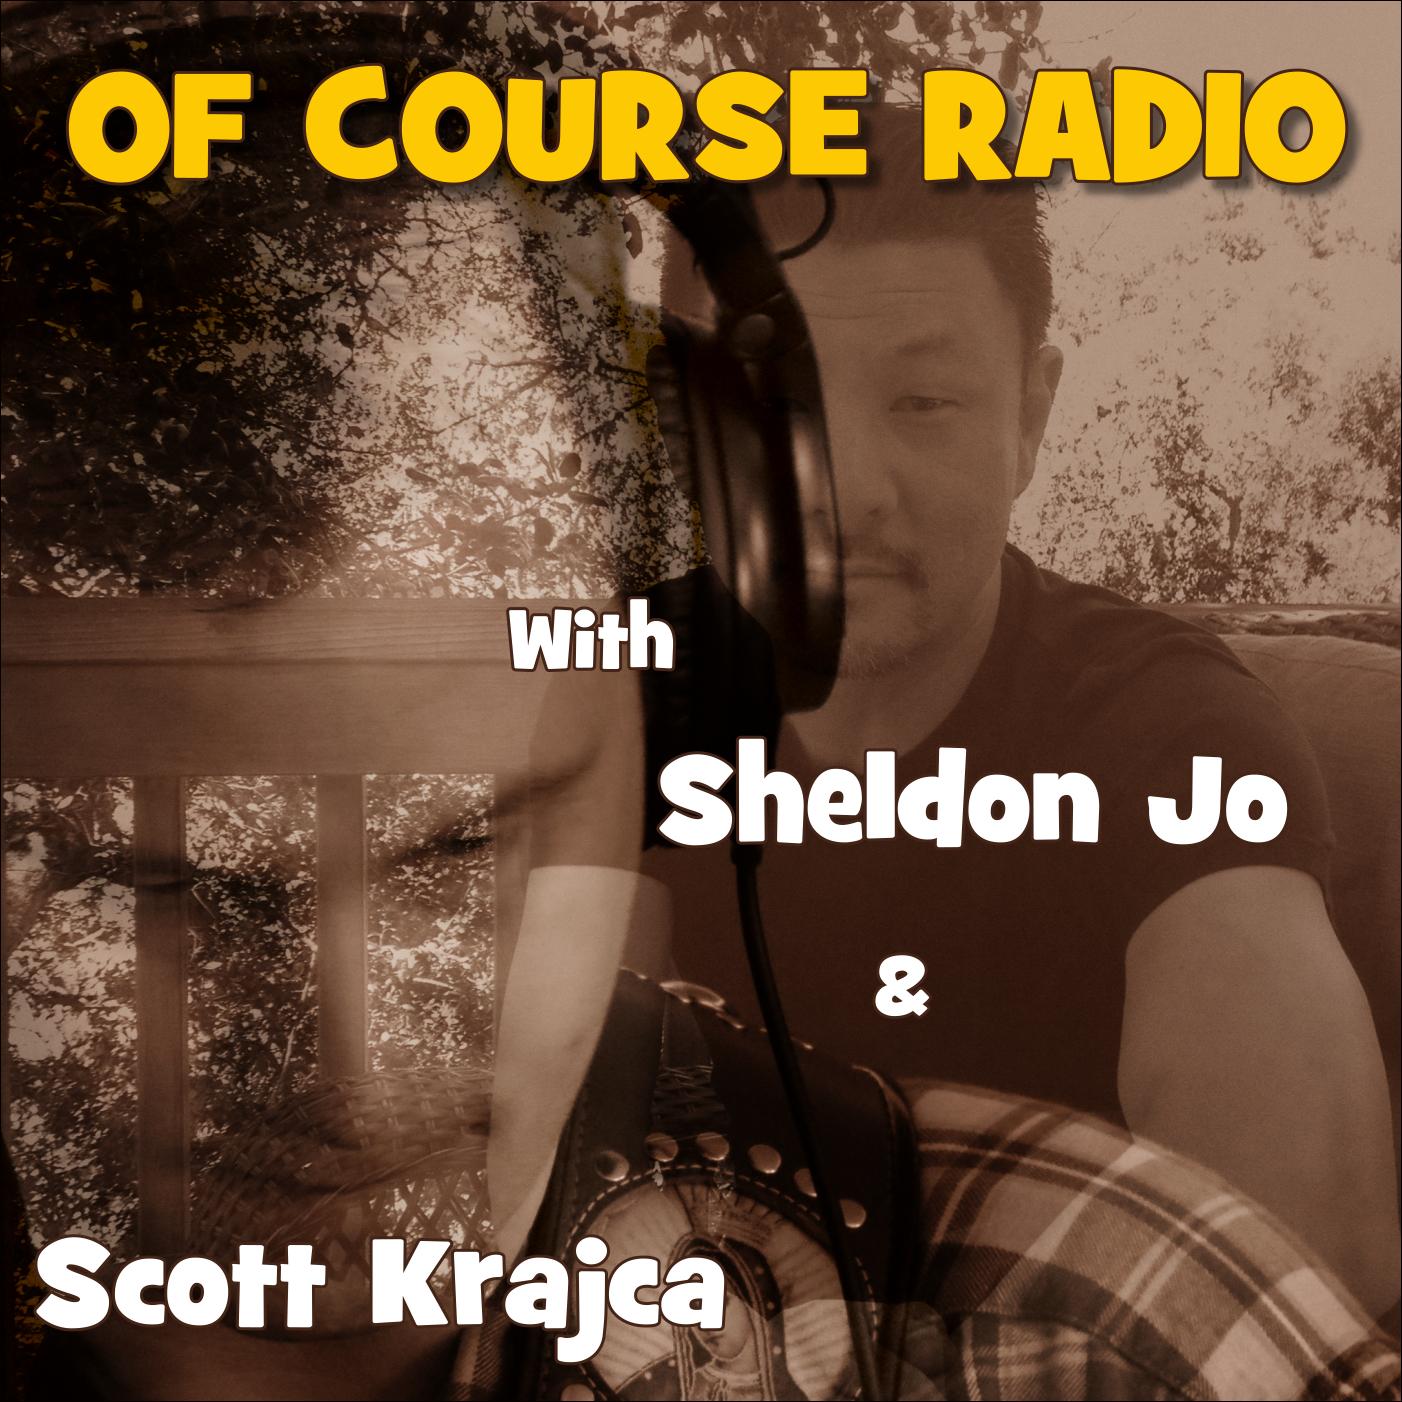 Of Course Radio with Scott Krajca and Sheldon Jo